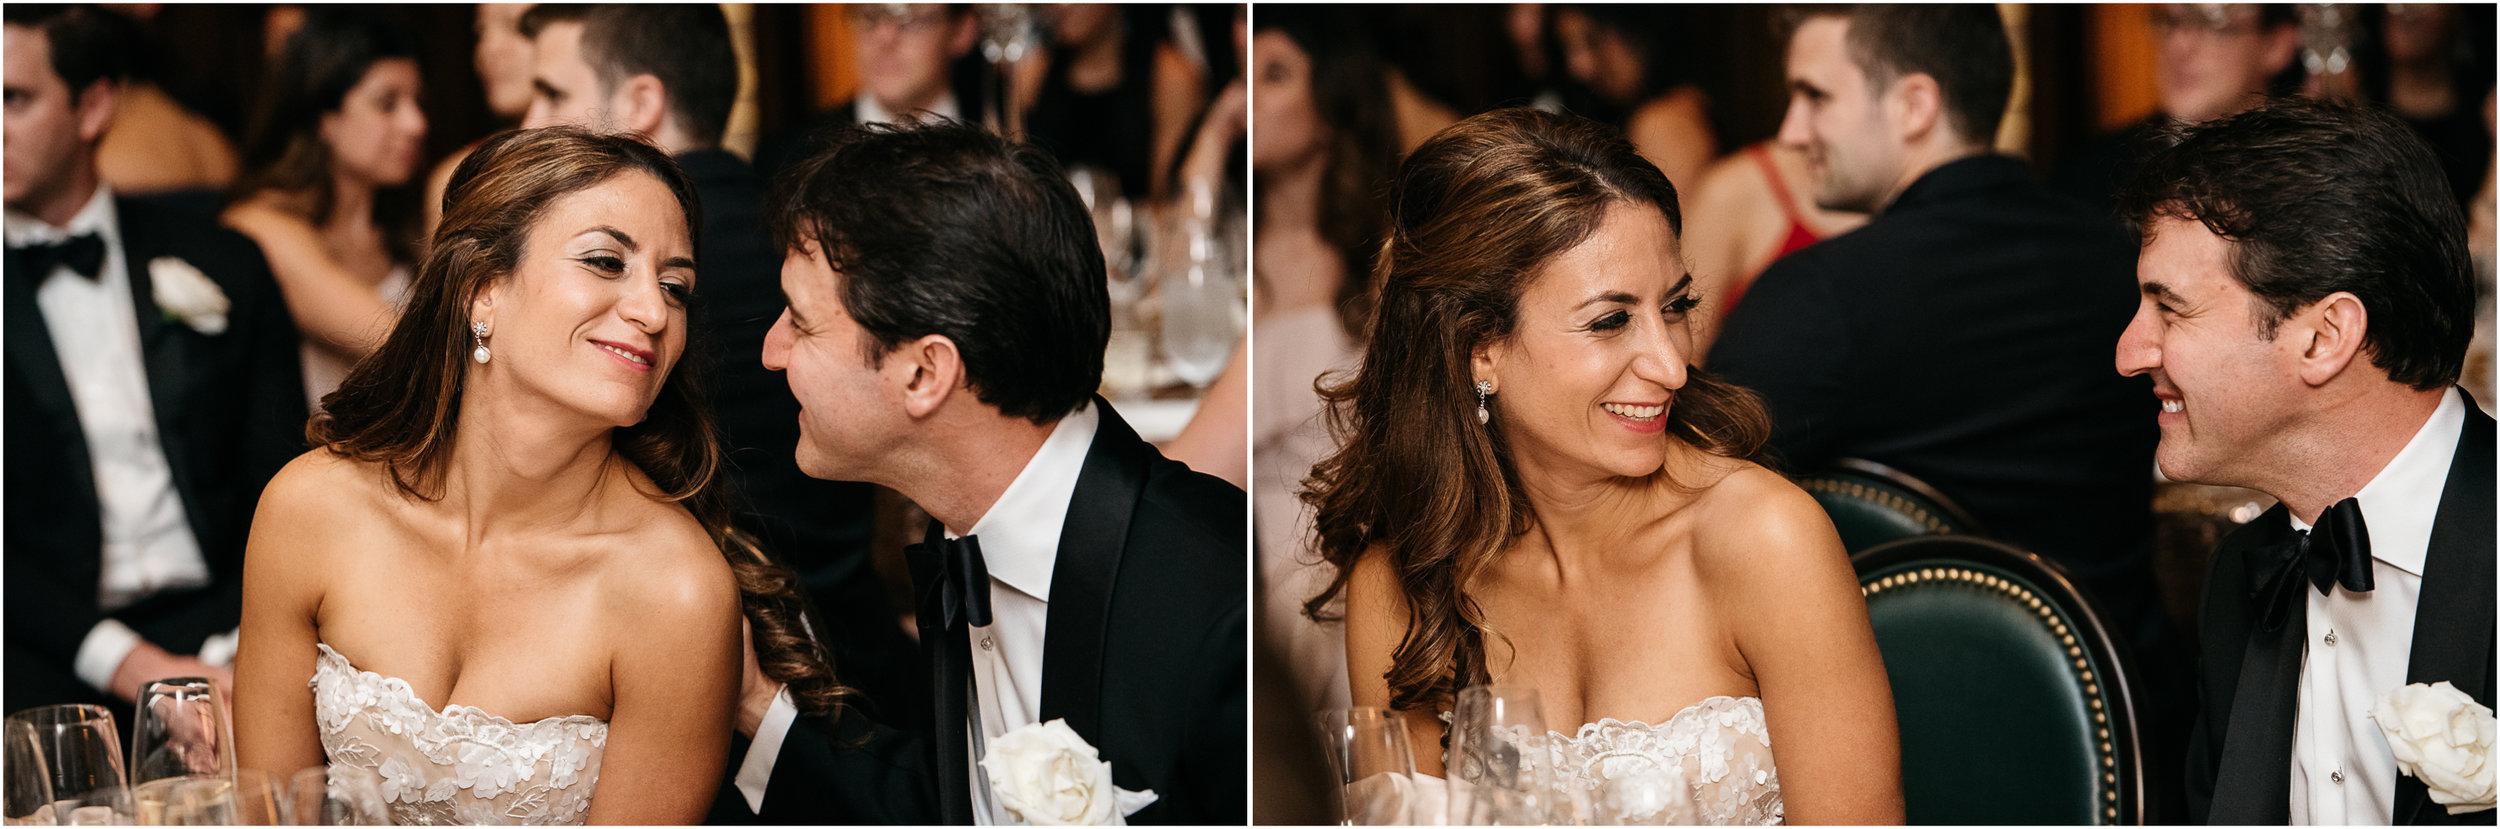 speeches duquesne club wedding.jpg